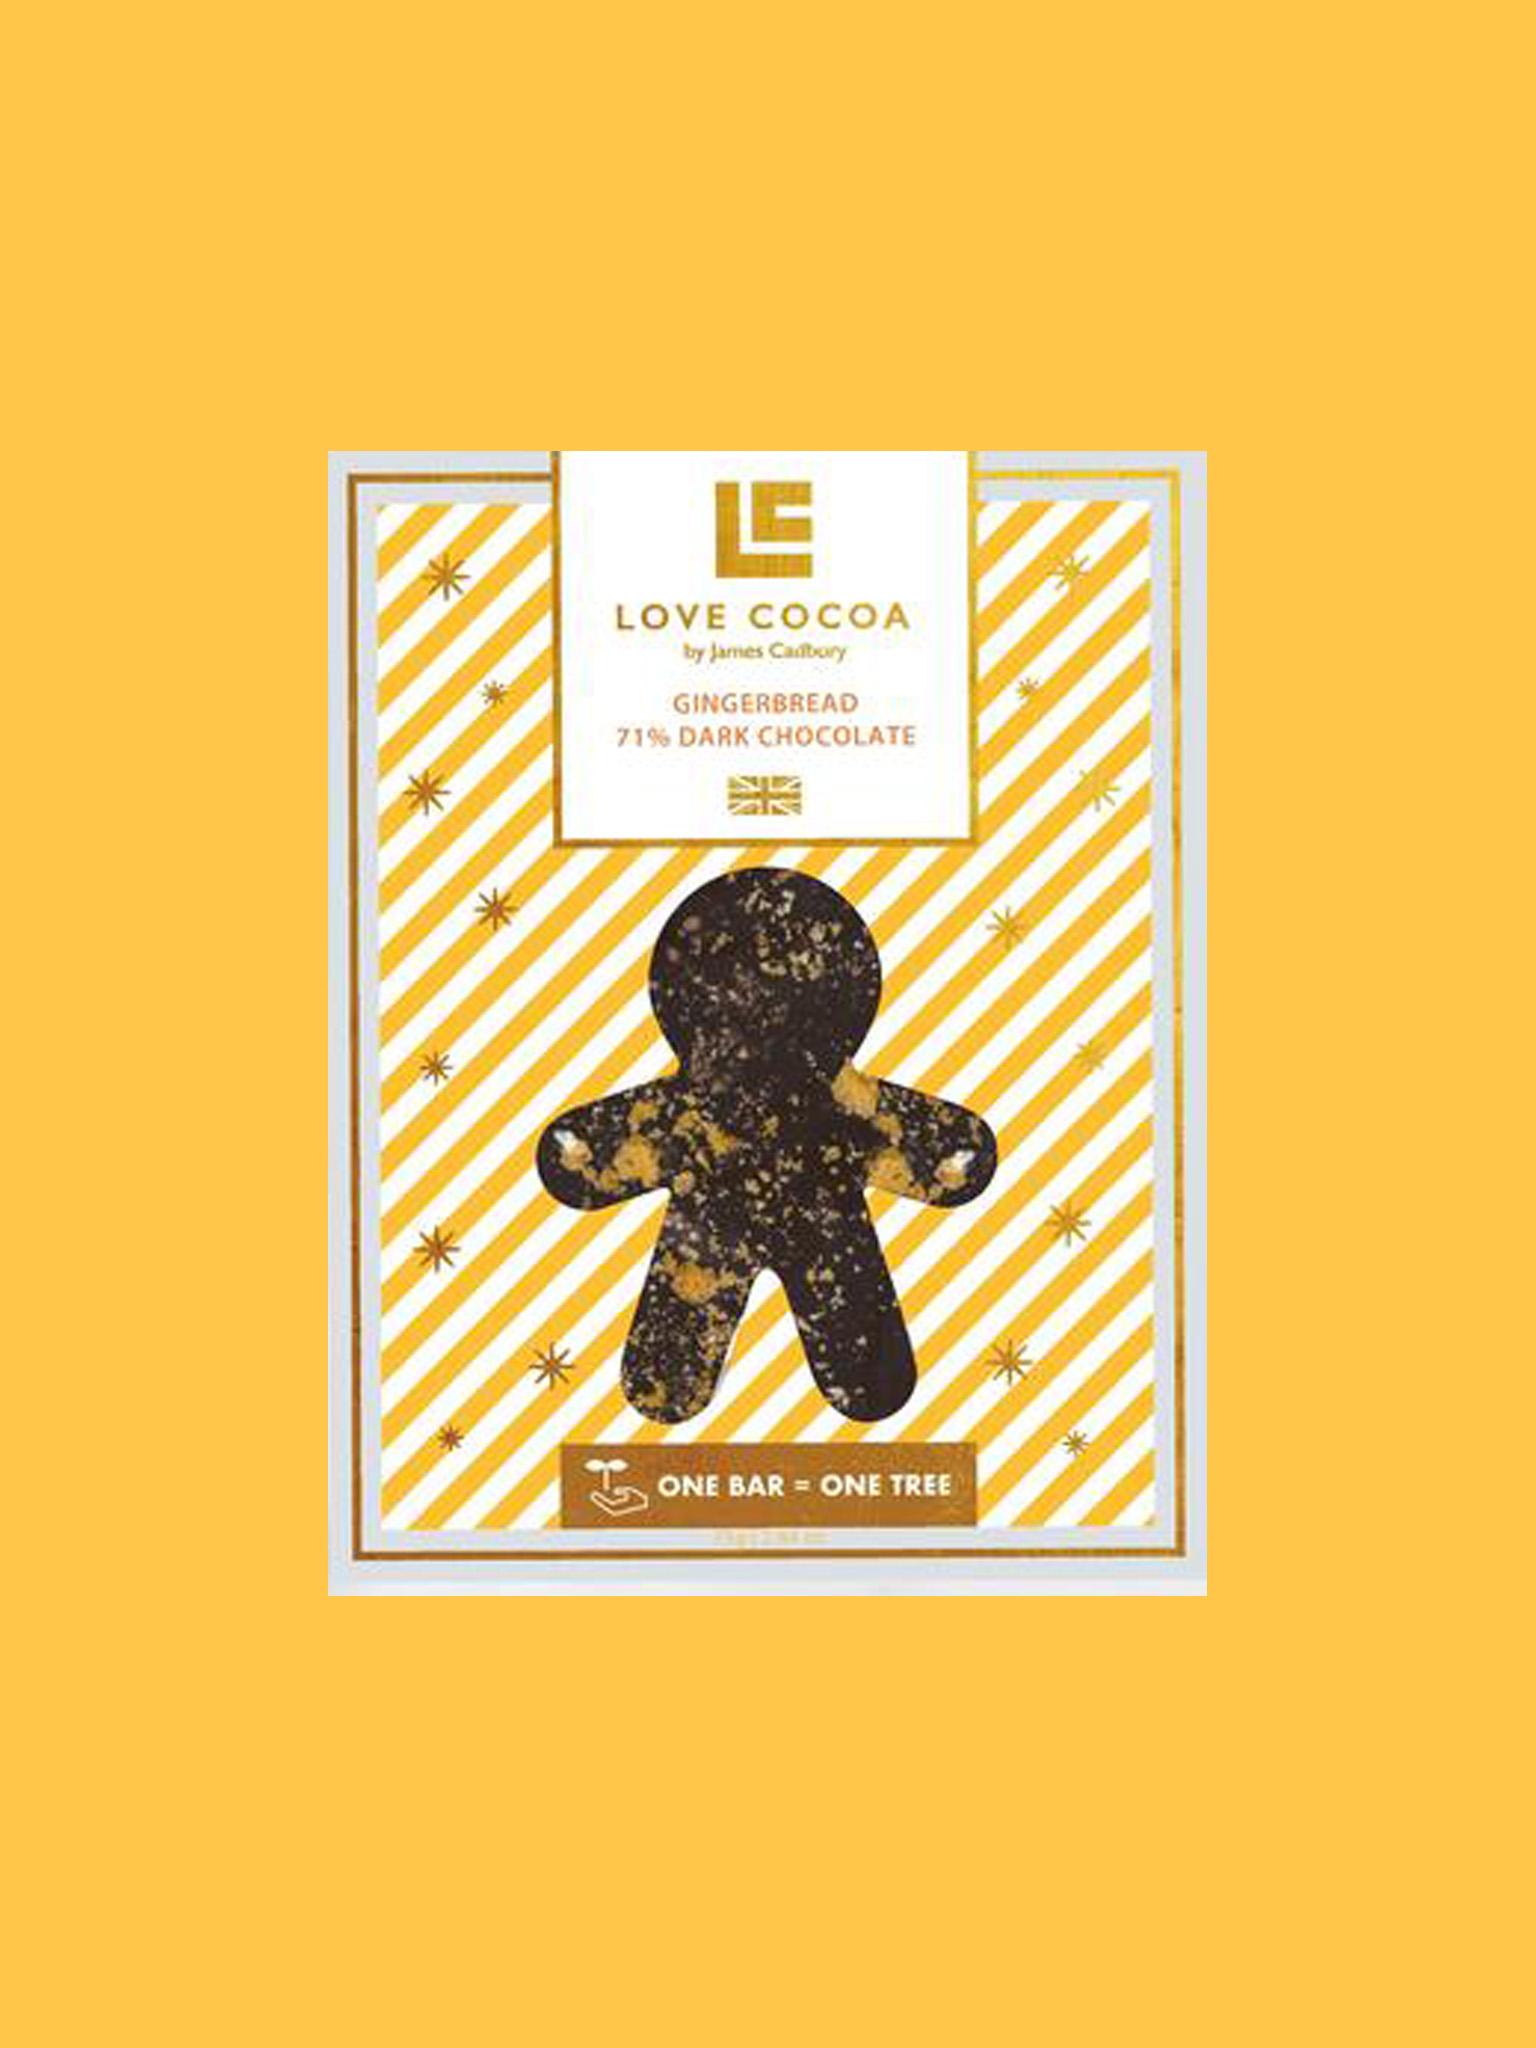 Love Cocoa X-Mas Gingerbread Dark Chocolate